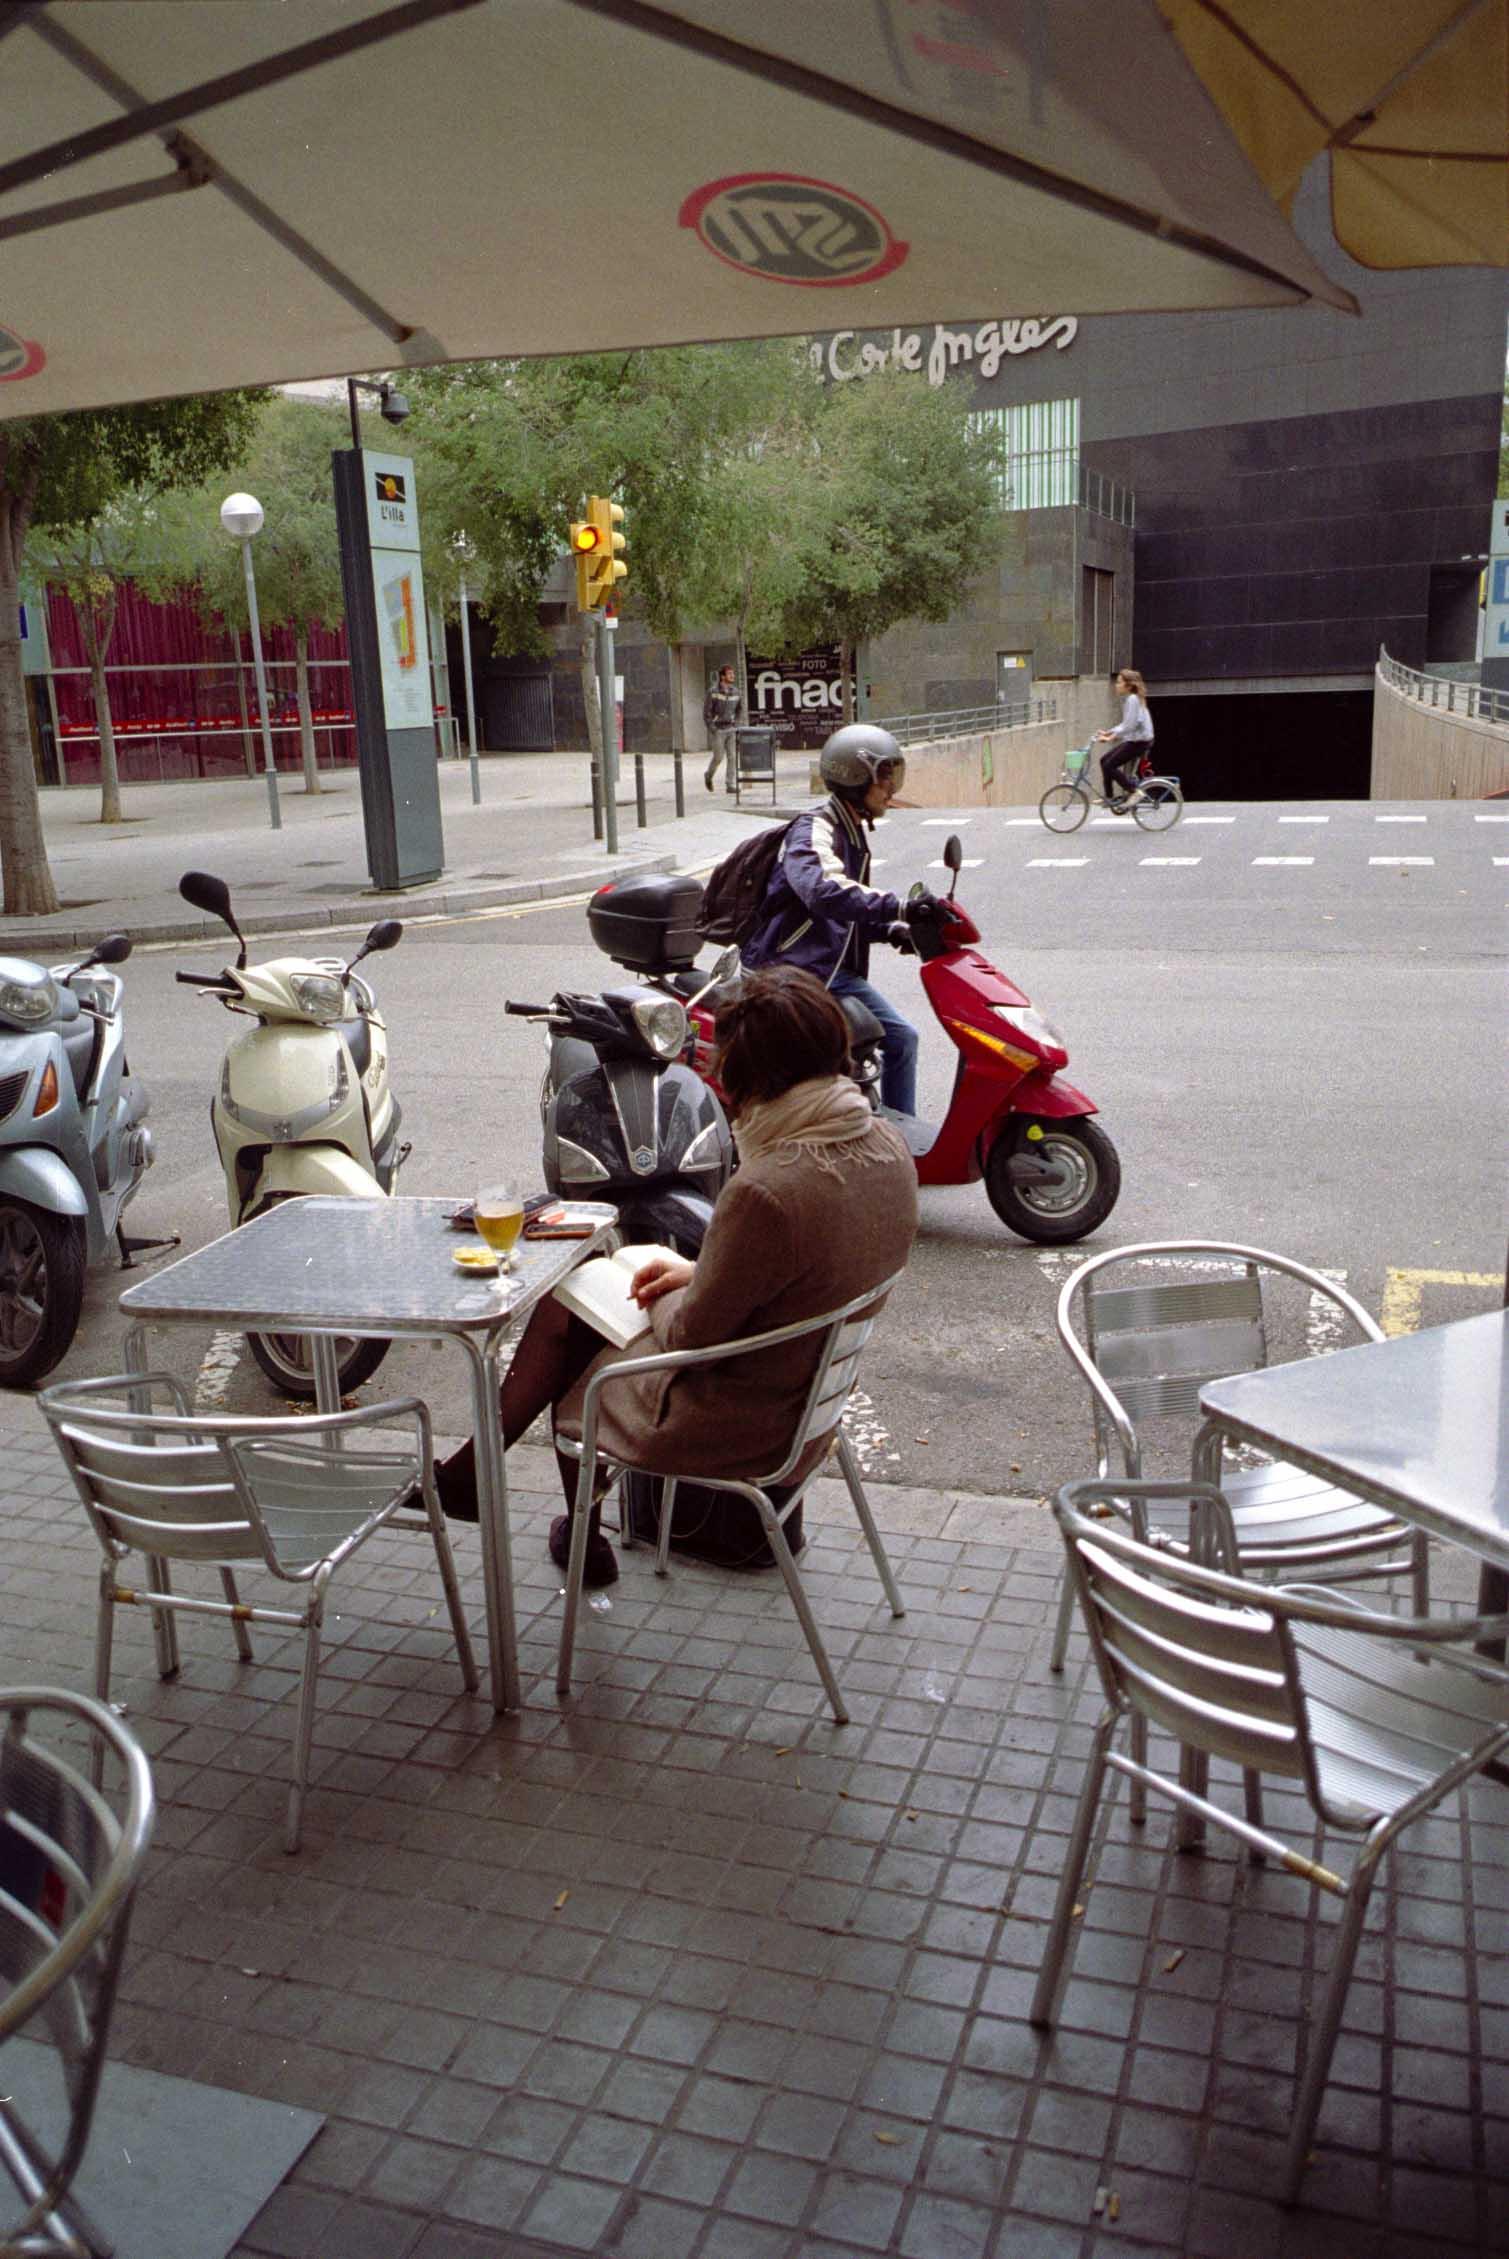 Barcelona, moto, lectora, grandes superficies